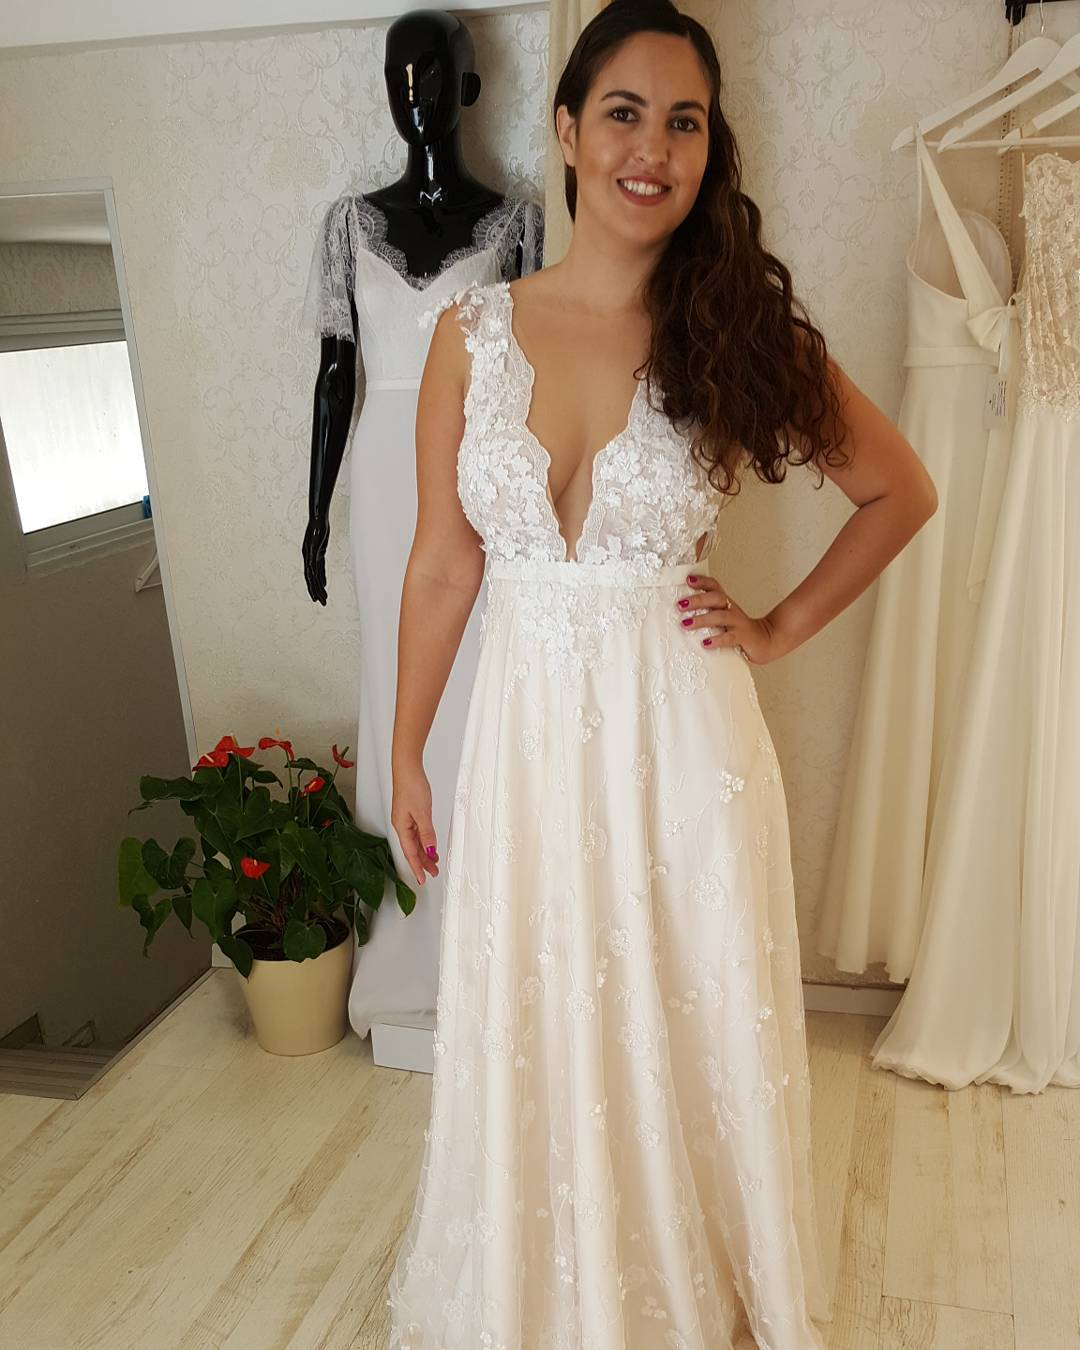 fcc2 - Deep v-neck wedding gowns for curvy plus size brides ...